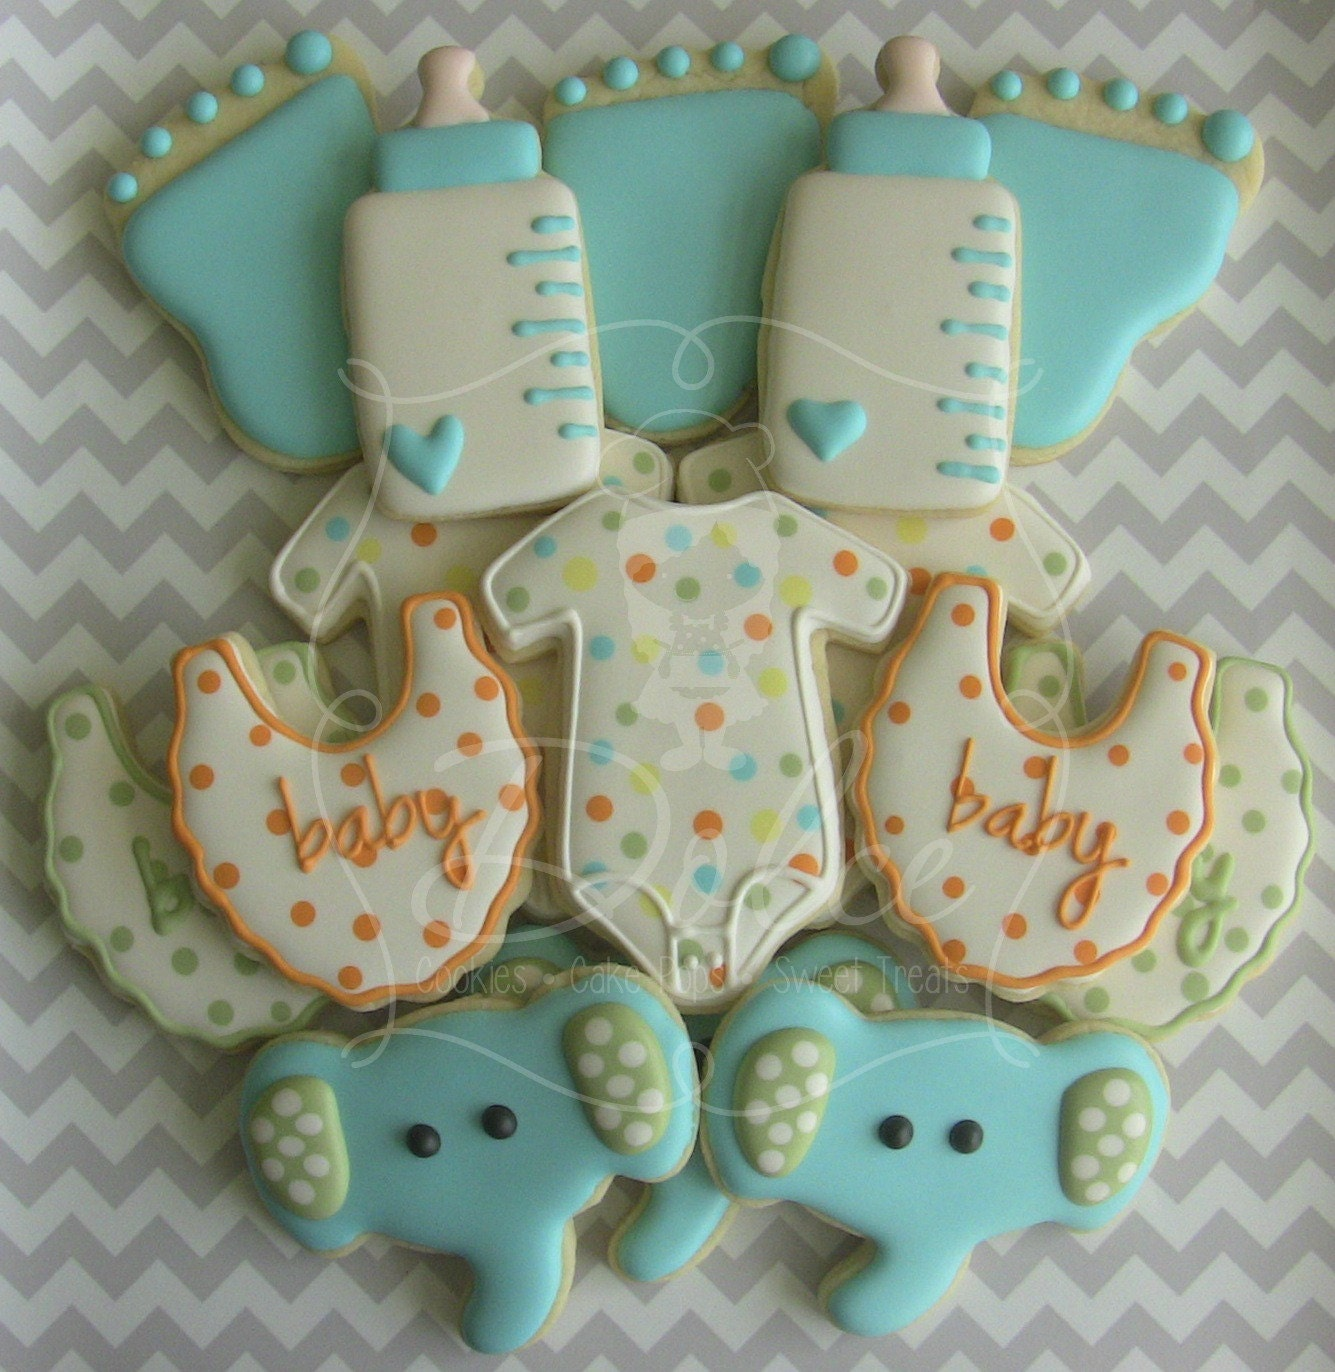 one dozen 12 welcome baby baby shower decorated sugar cookies